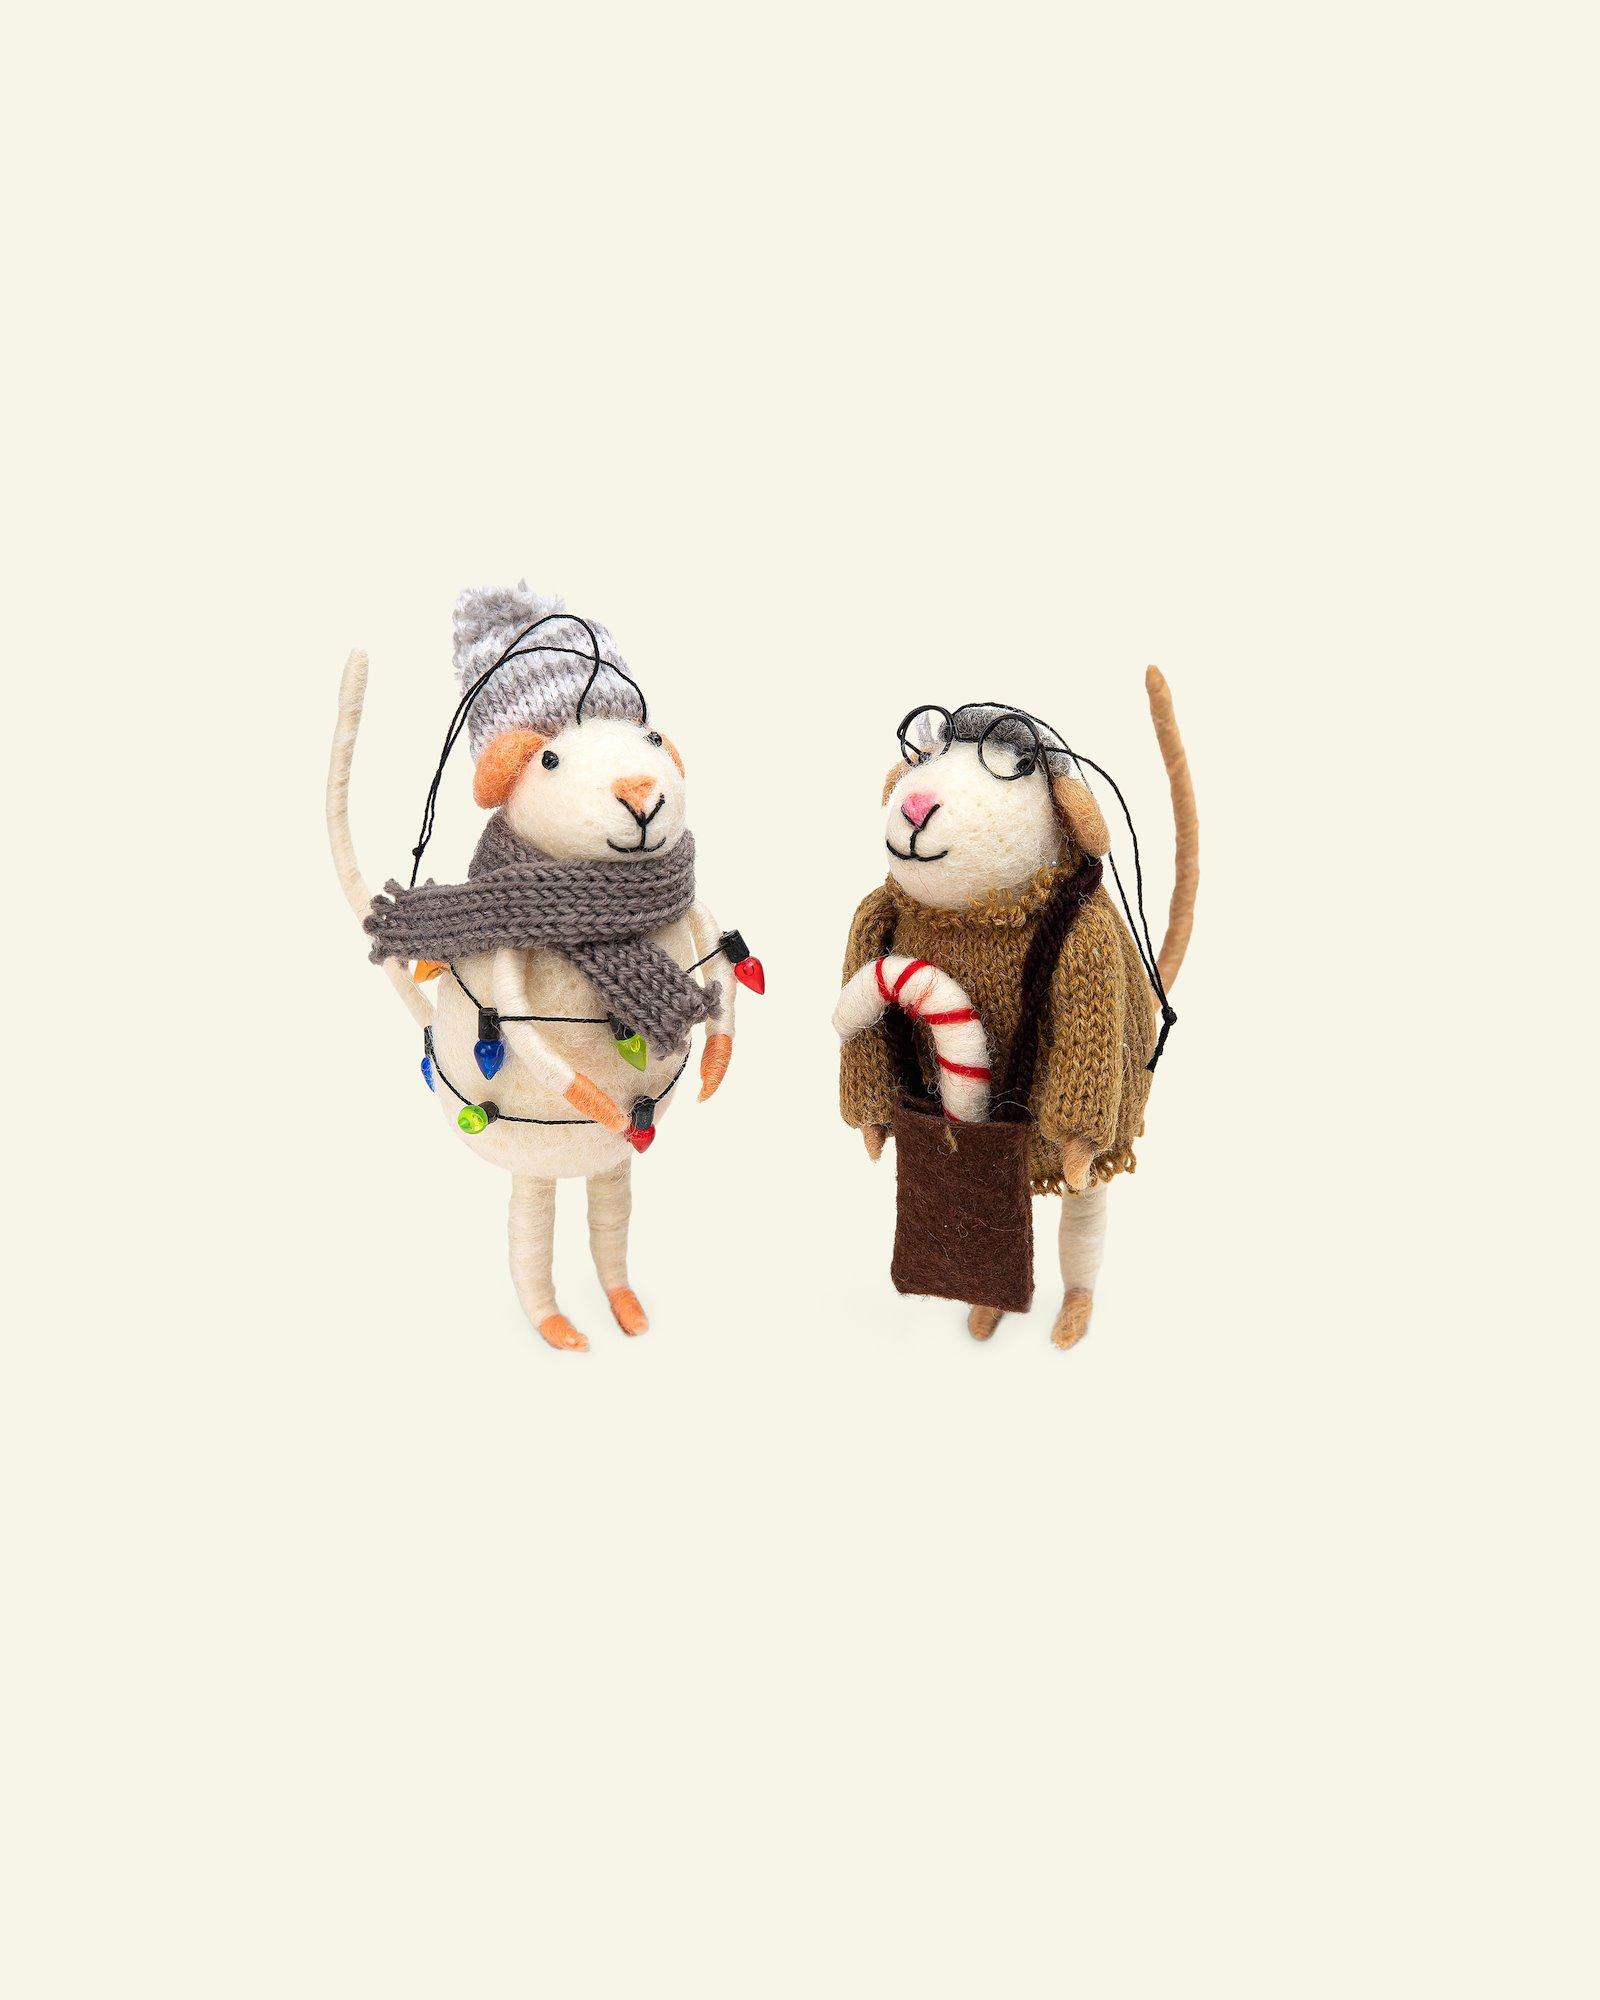 Kit wool mouse winter 12cm 2pcs